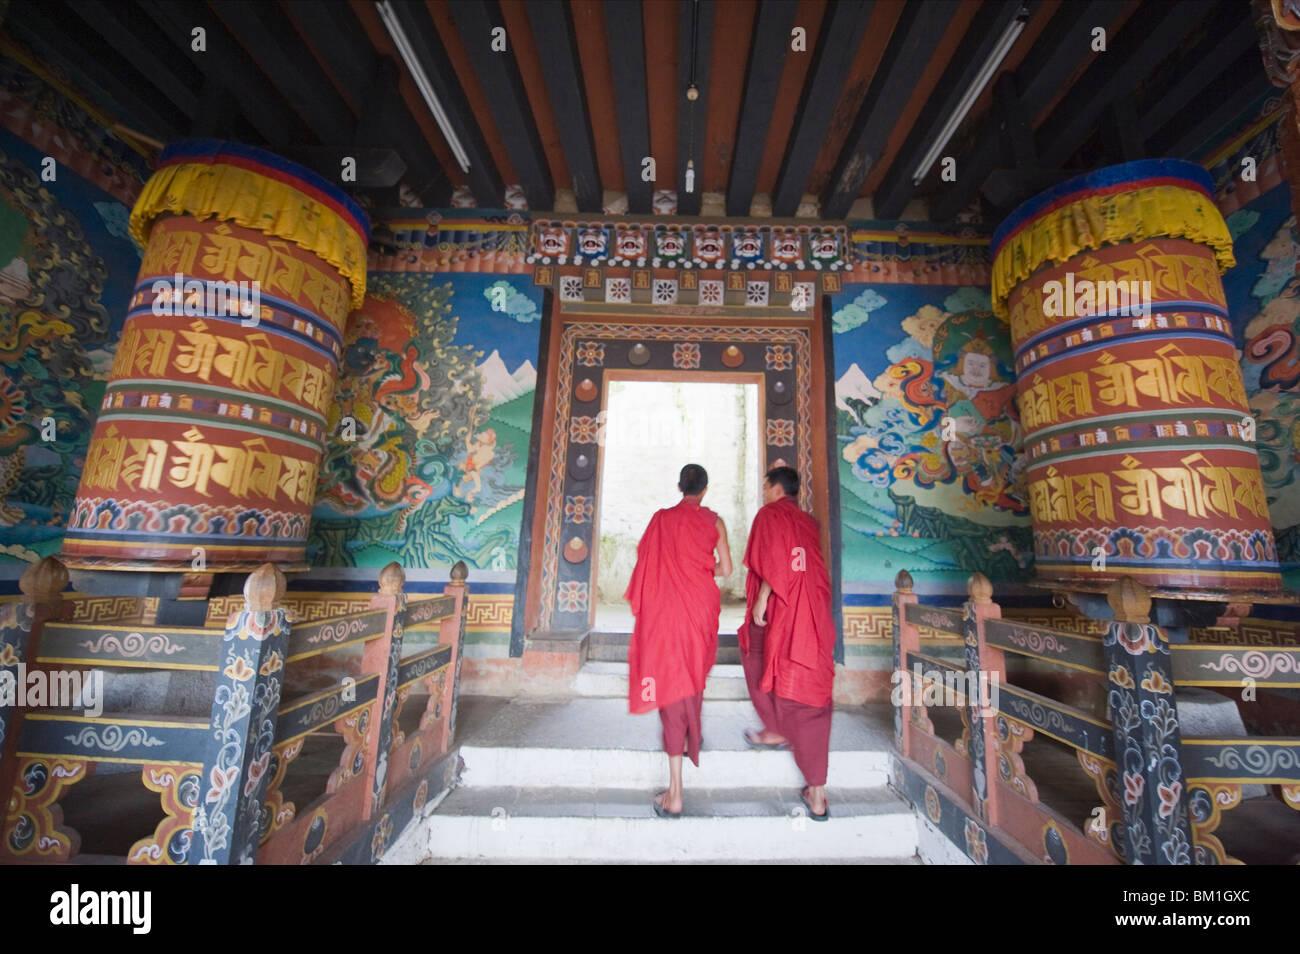 Monks walking between prayer wheels at Trongsa Dzong (Chokhor Raptentse) dating from 1648, Bhutan Asia - Stock Image